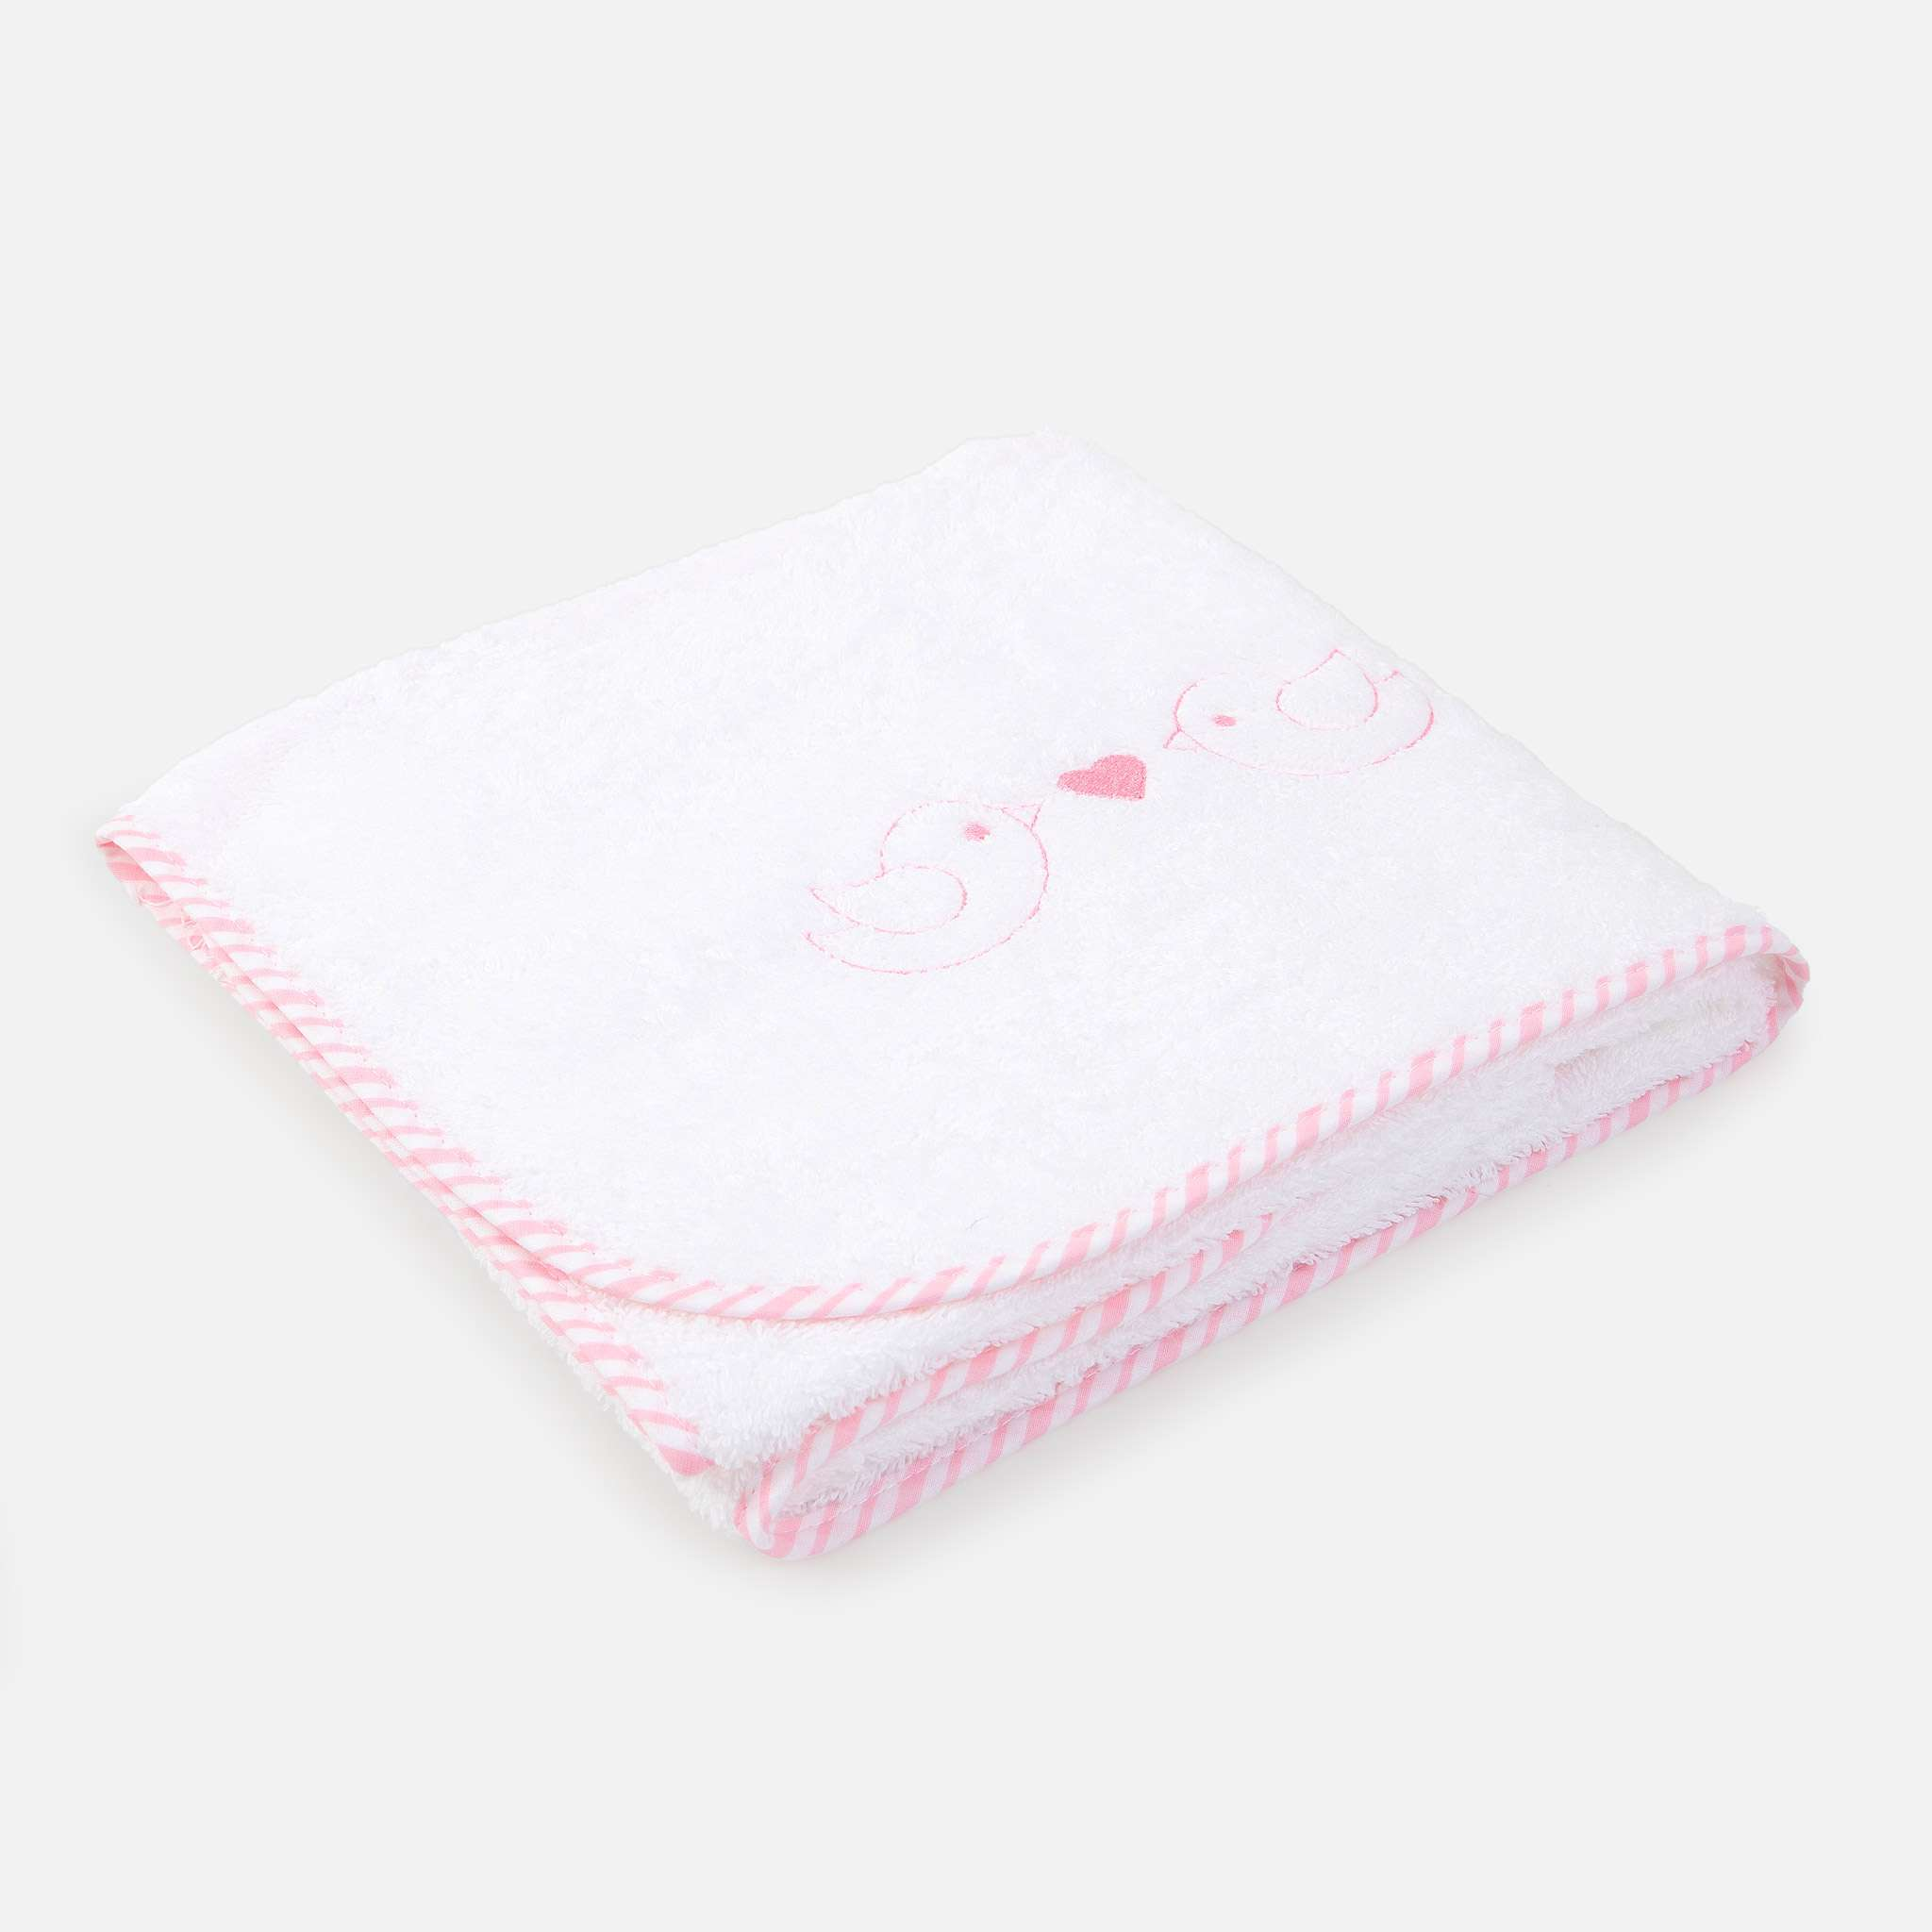 Ballon Pink håndkle 72x72 cm